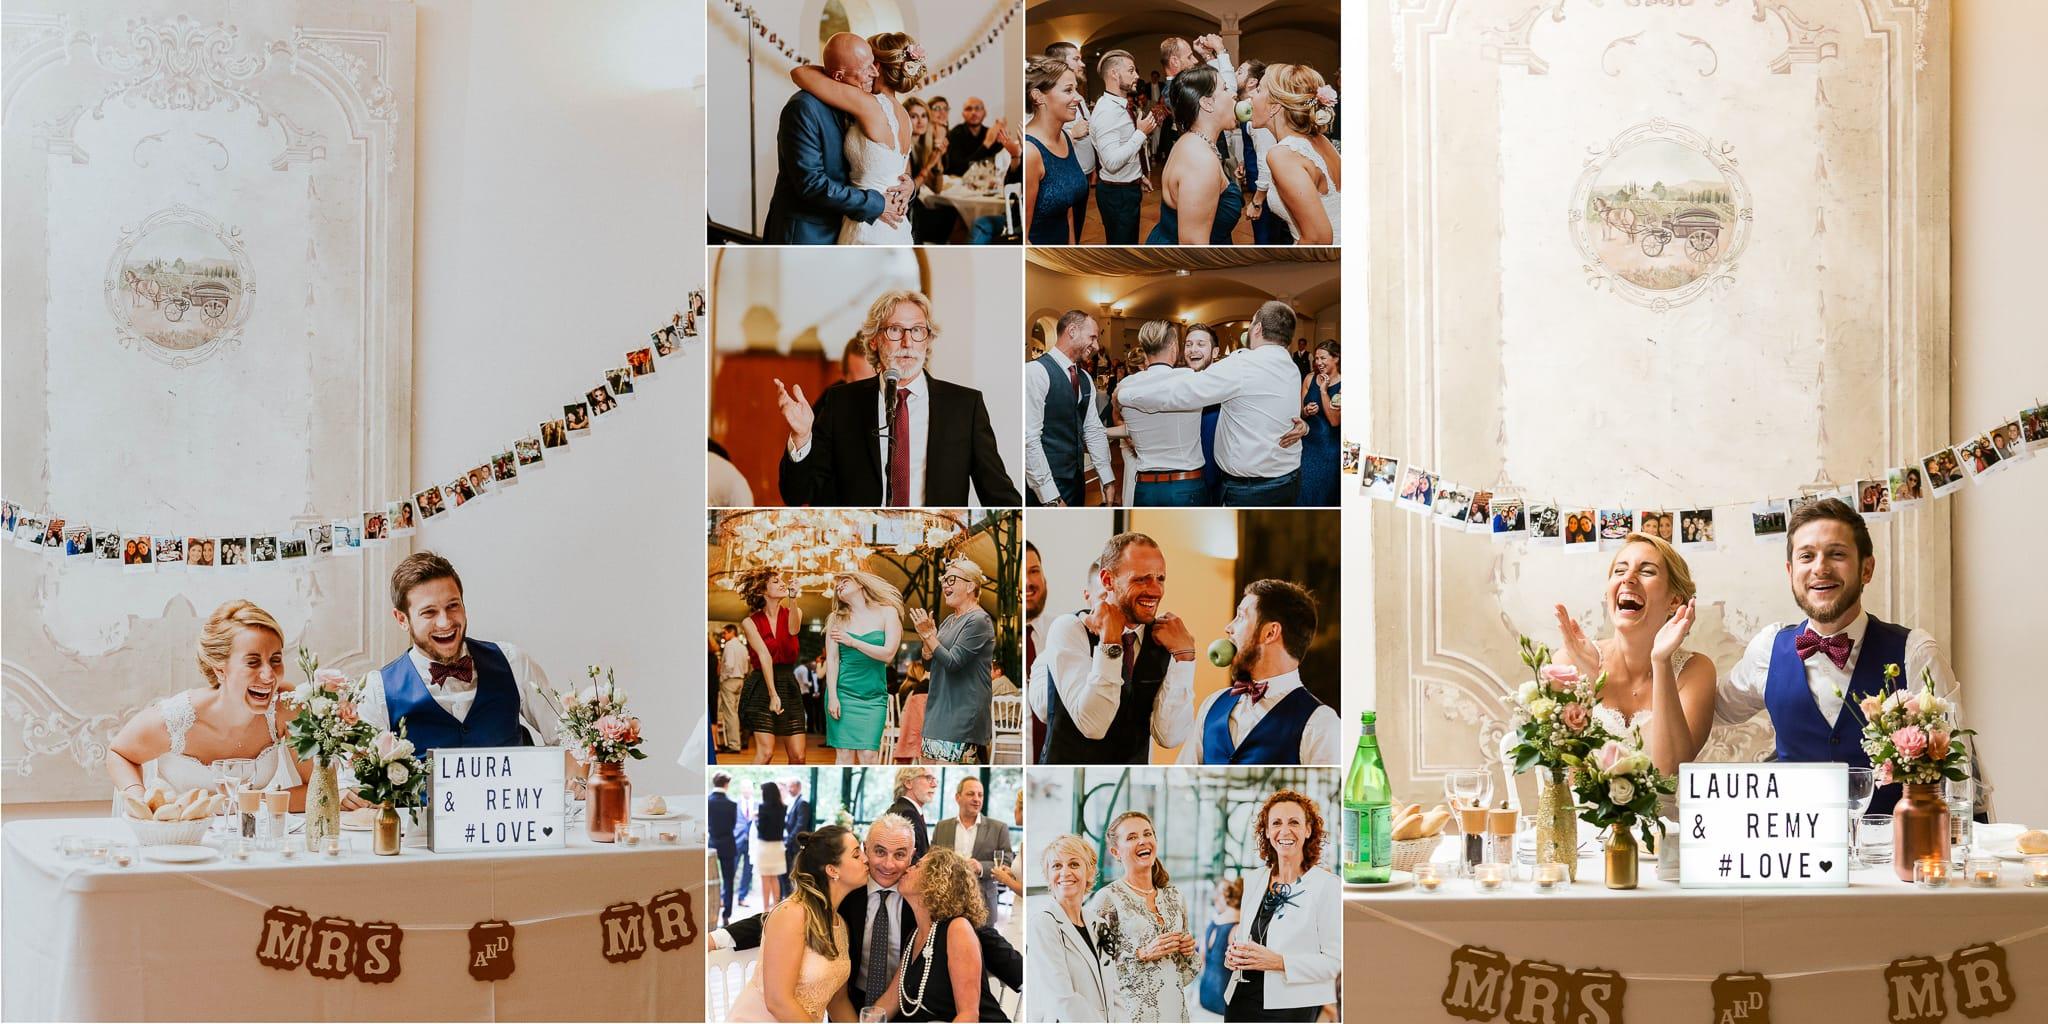 Costi-Moiceanu-Photographer-CM-Photography-Wedding-Mariage-French-Riviera-Cote-D-Azur-Alpes-Maritimes-Weding-Album-Design-19